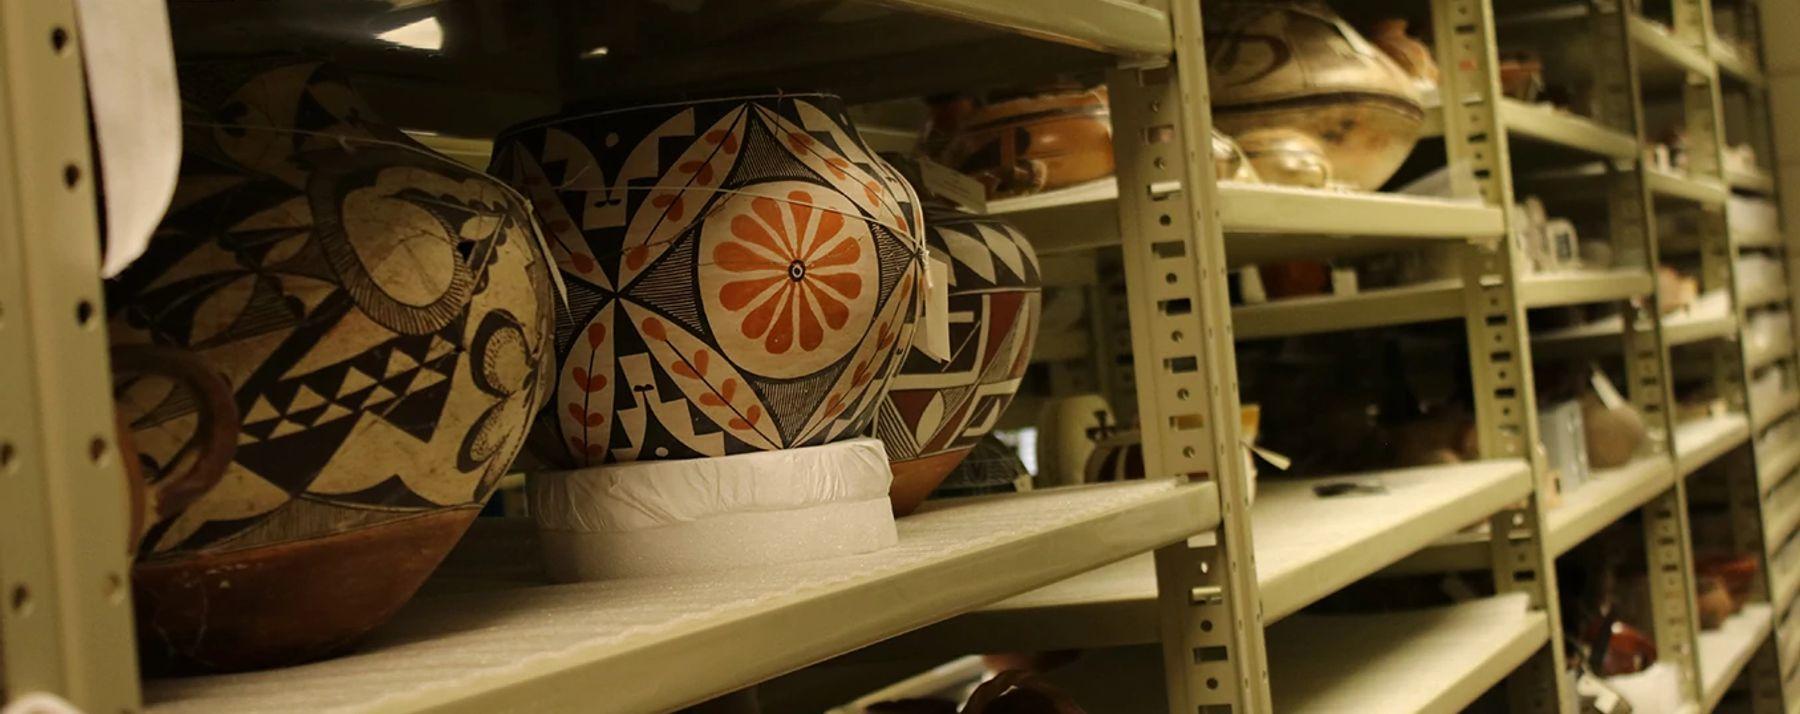 Ceramics on DUMA Collections Shelves